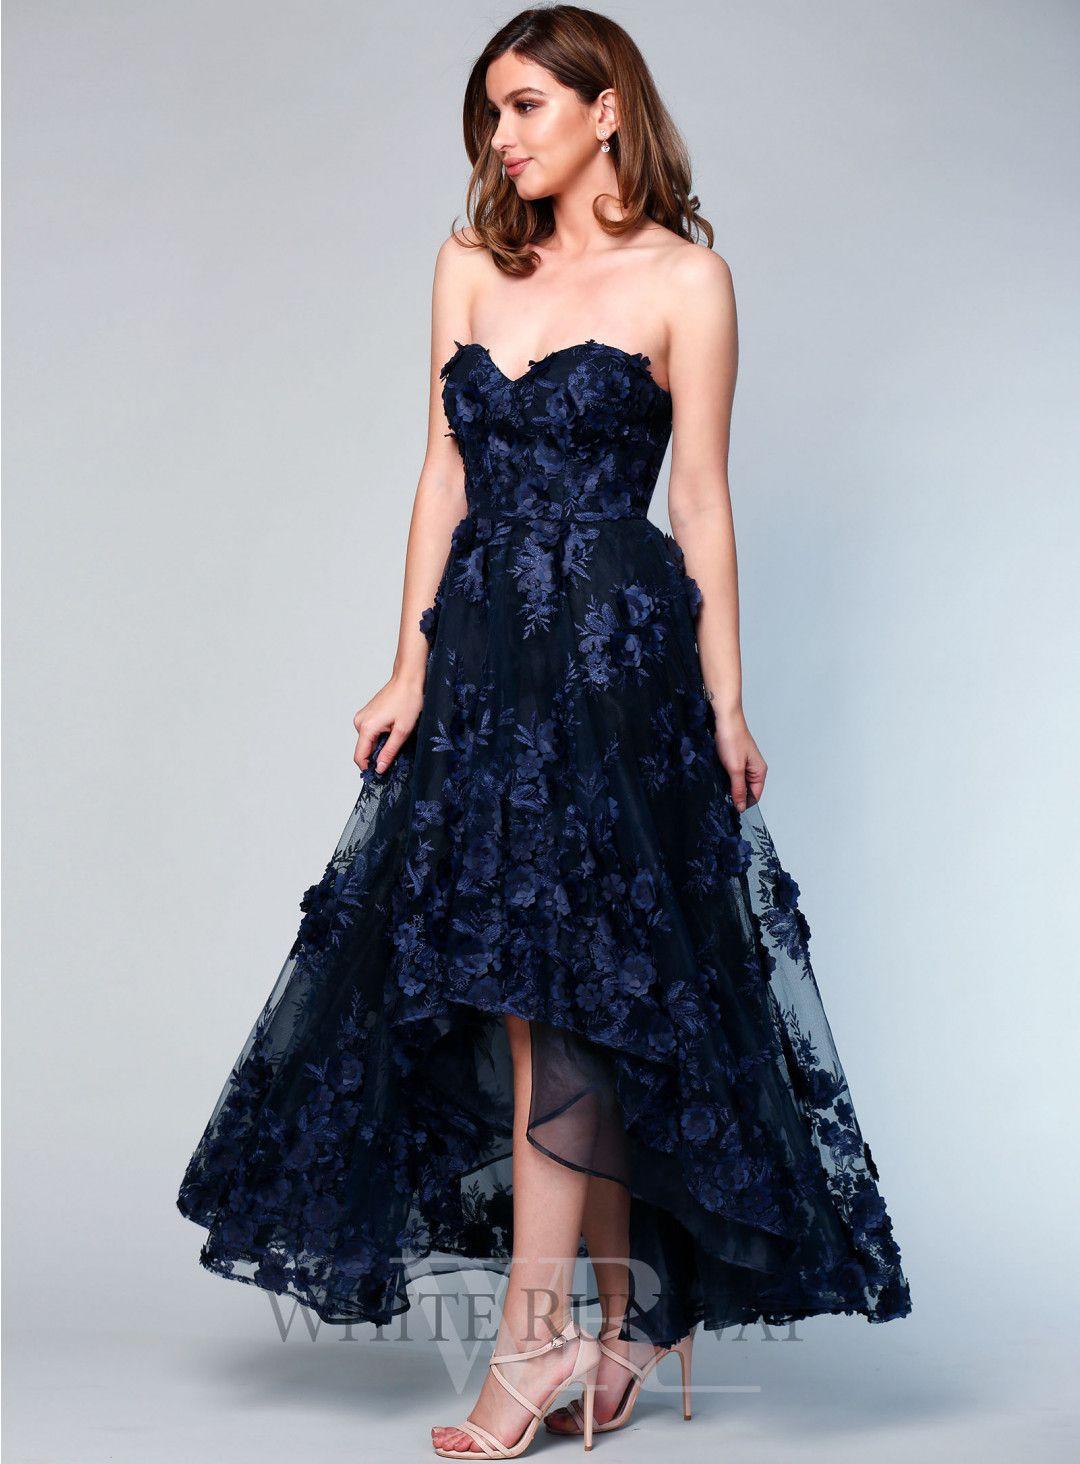 307a1137d6 Rosetta Lace Gown. A stunning full length dress by Grace   Hart. Features a  sweetheart neckline